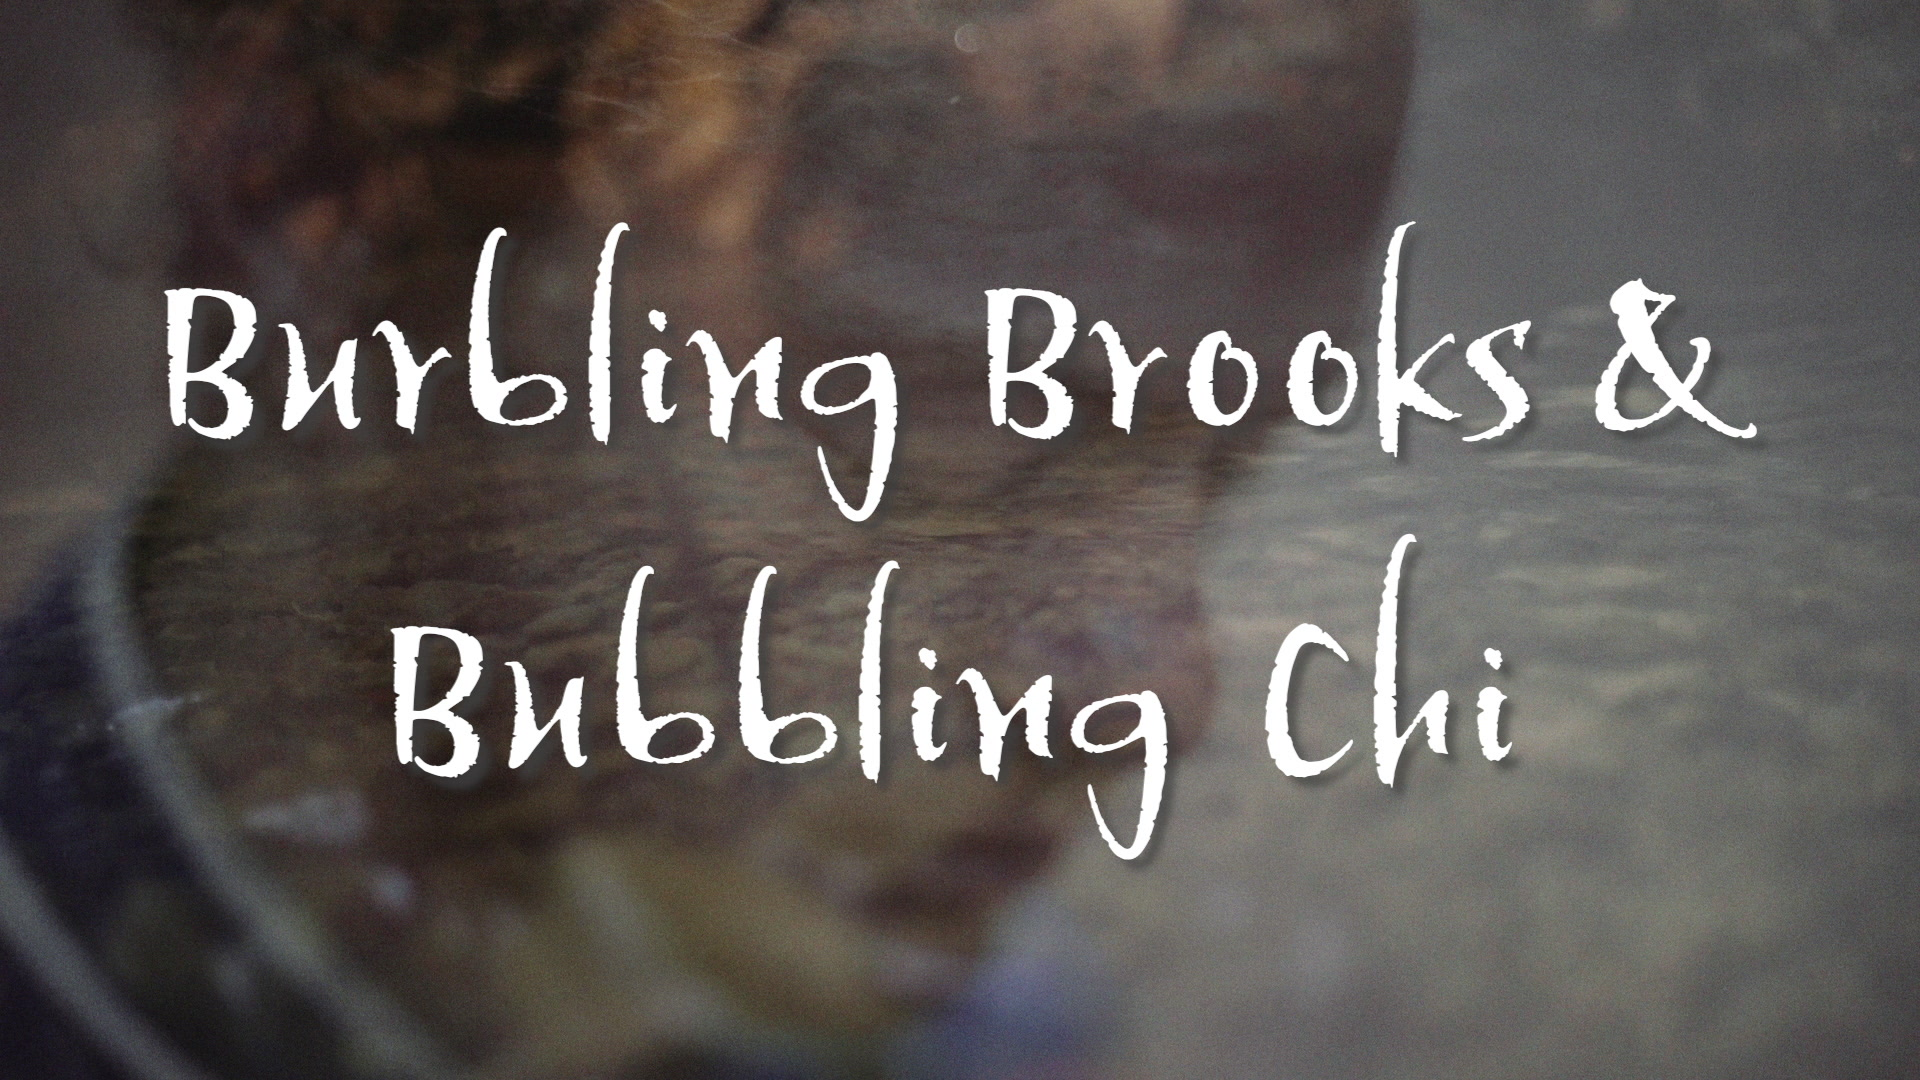 Burbling Brooks Bubbling Qi